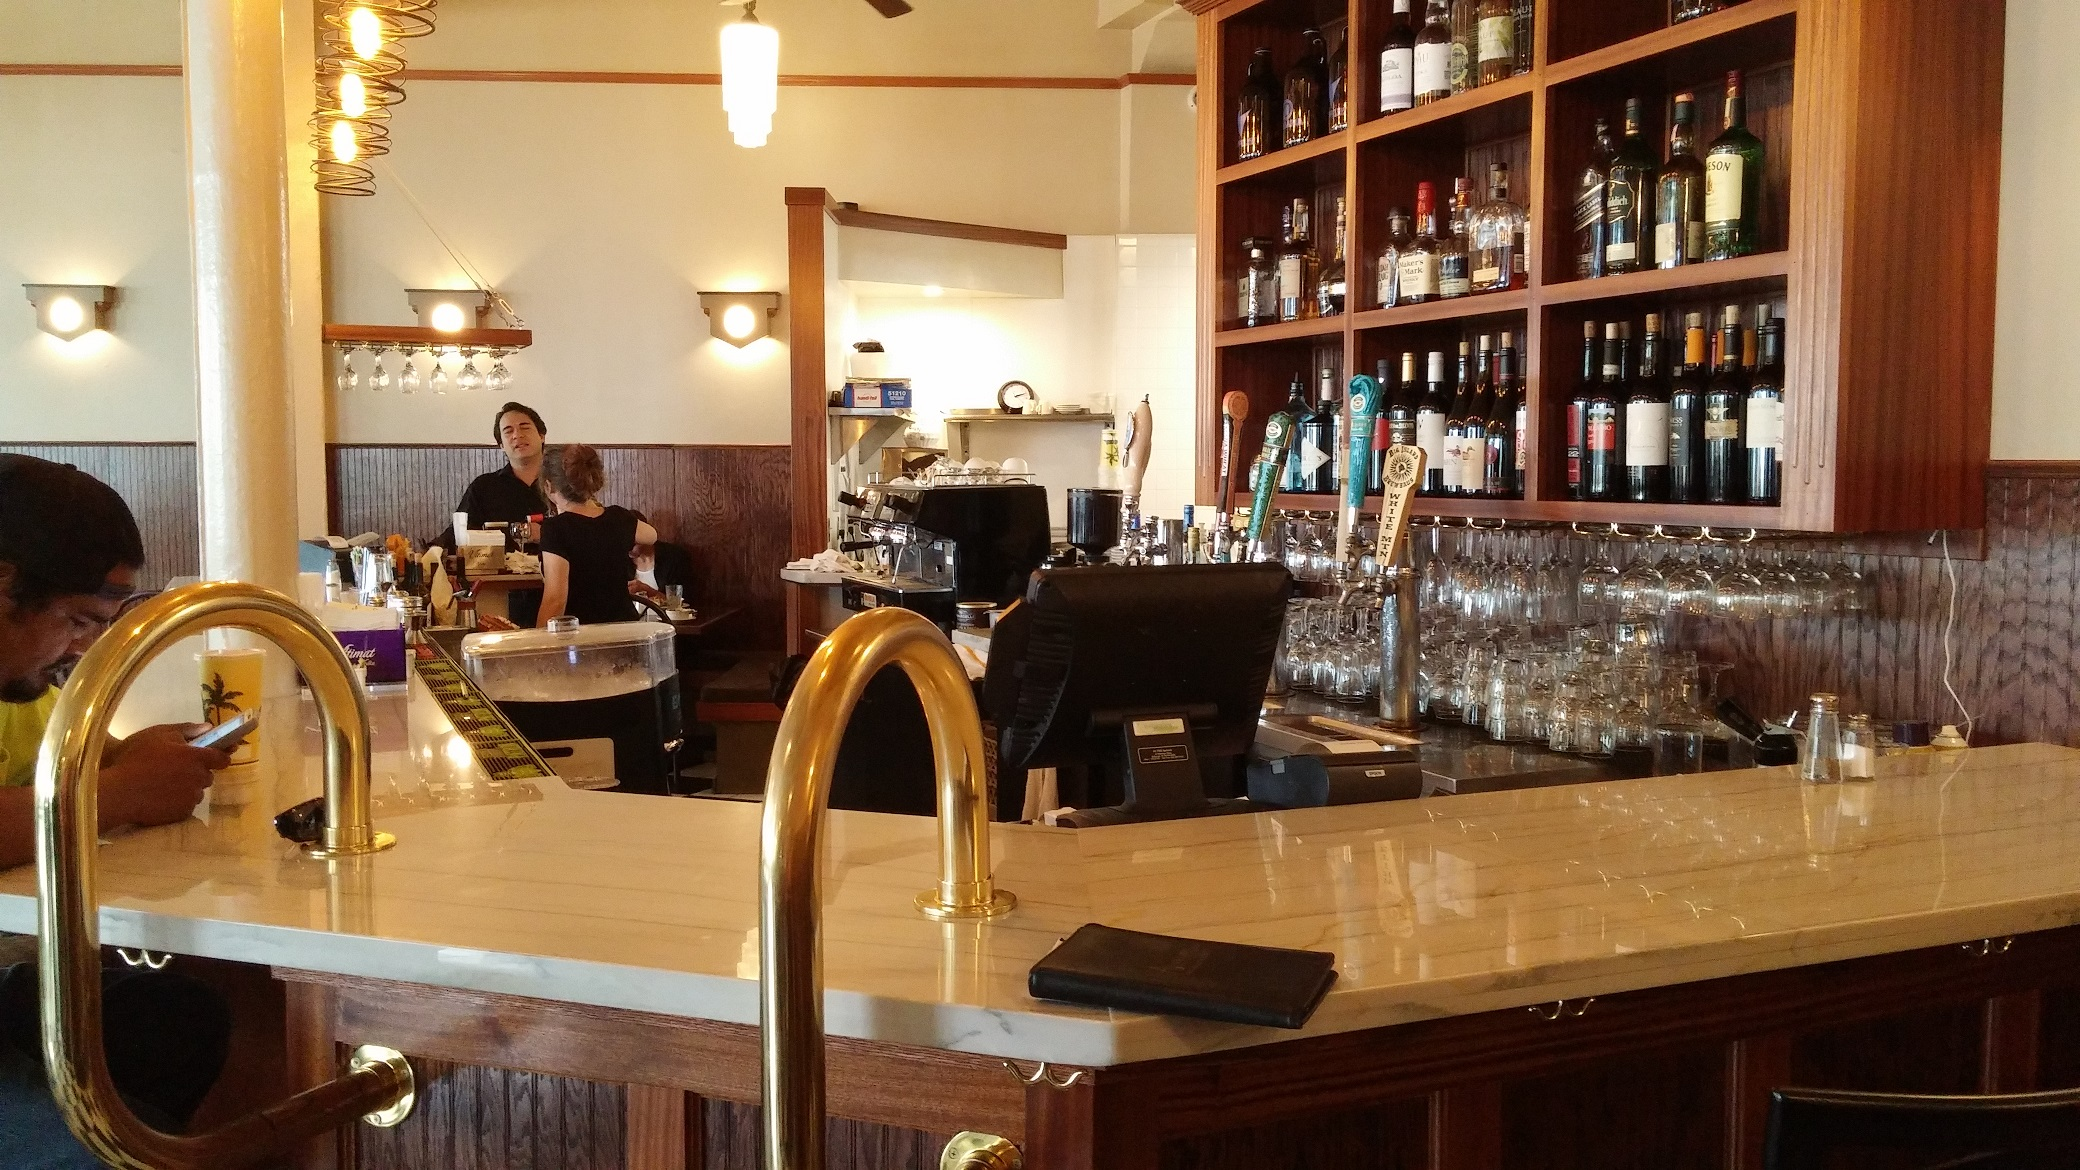 Big Island Cafe Pesto